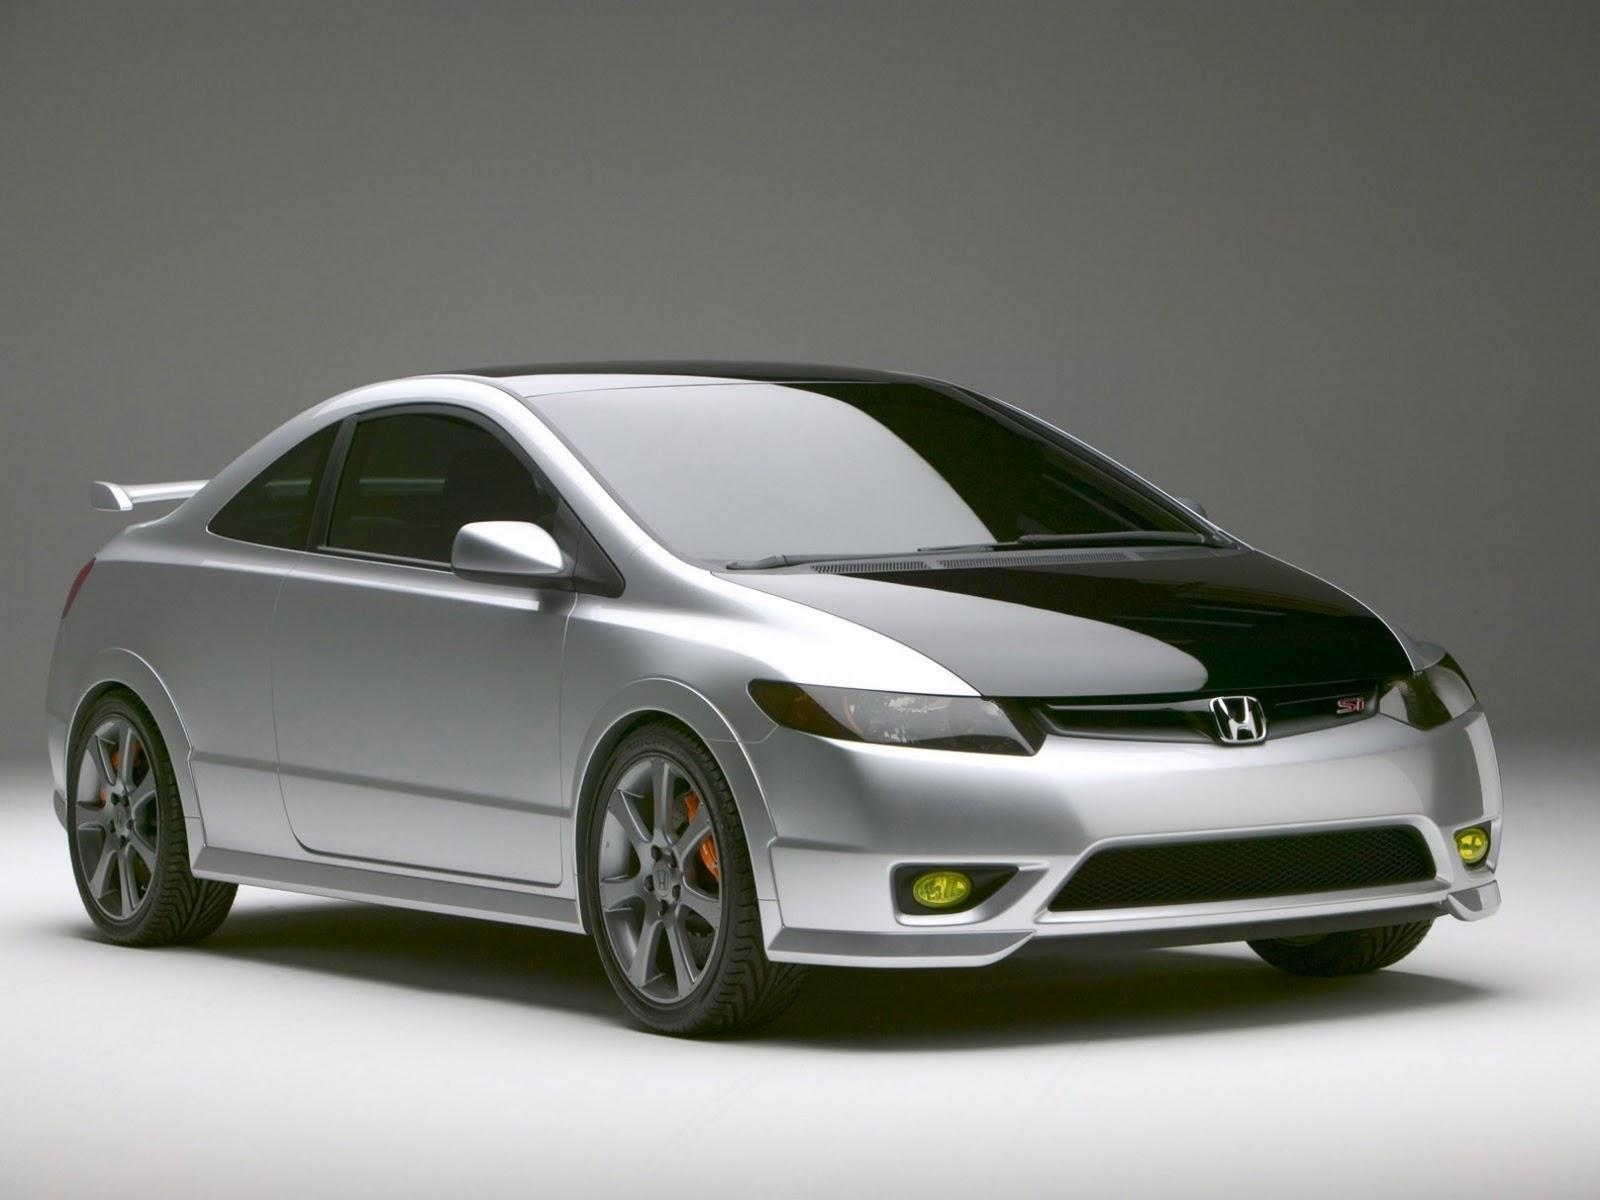 New Topten Cars Blog Honda Civic Si 2011 Photos